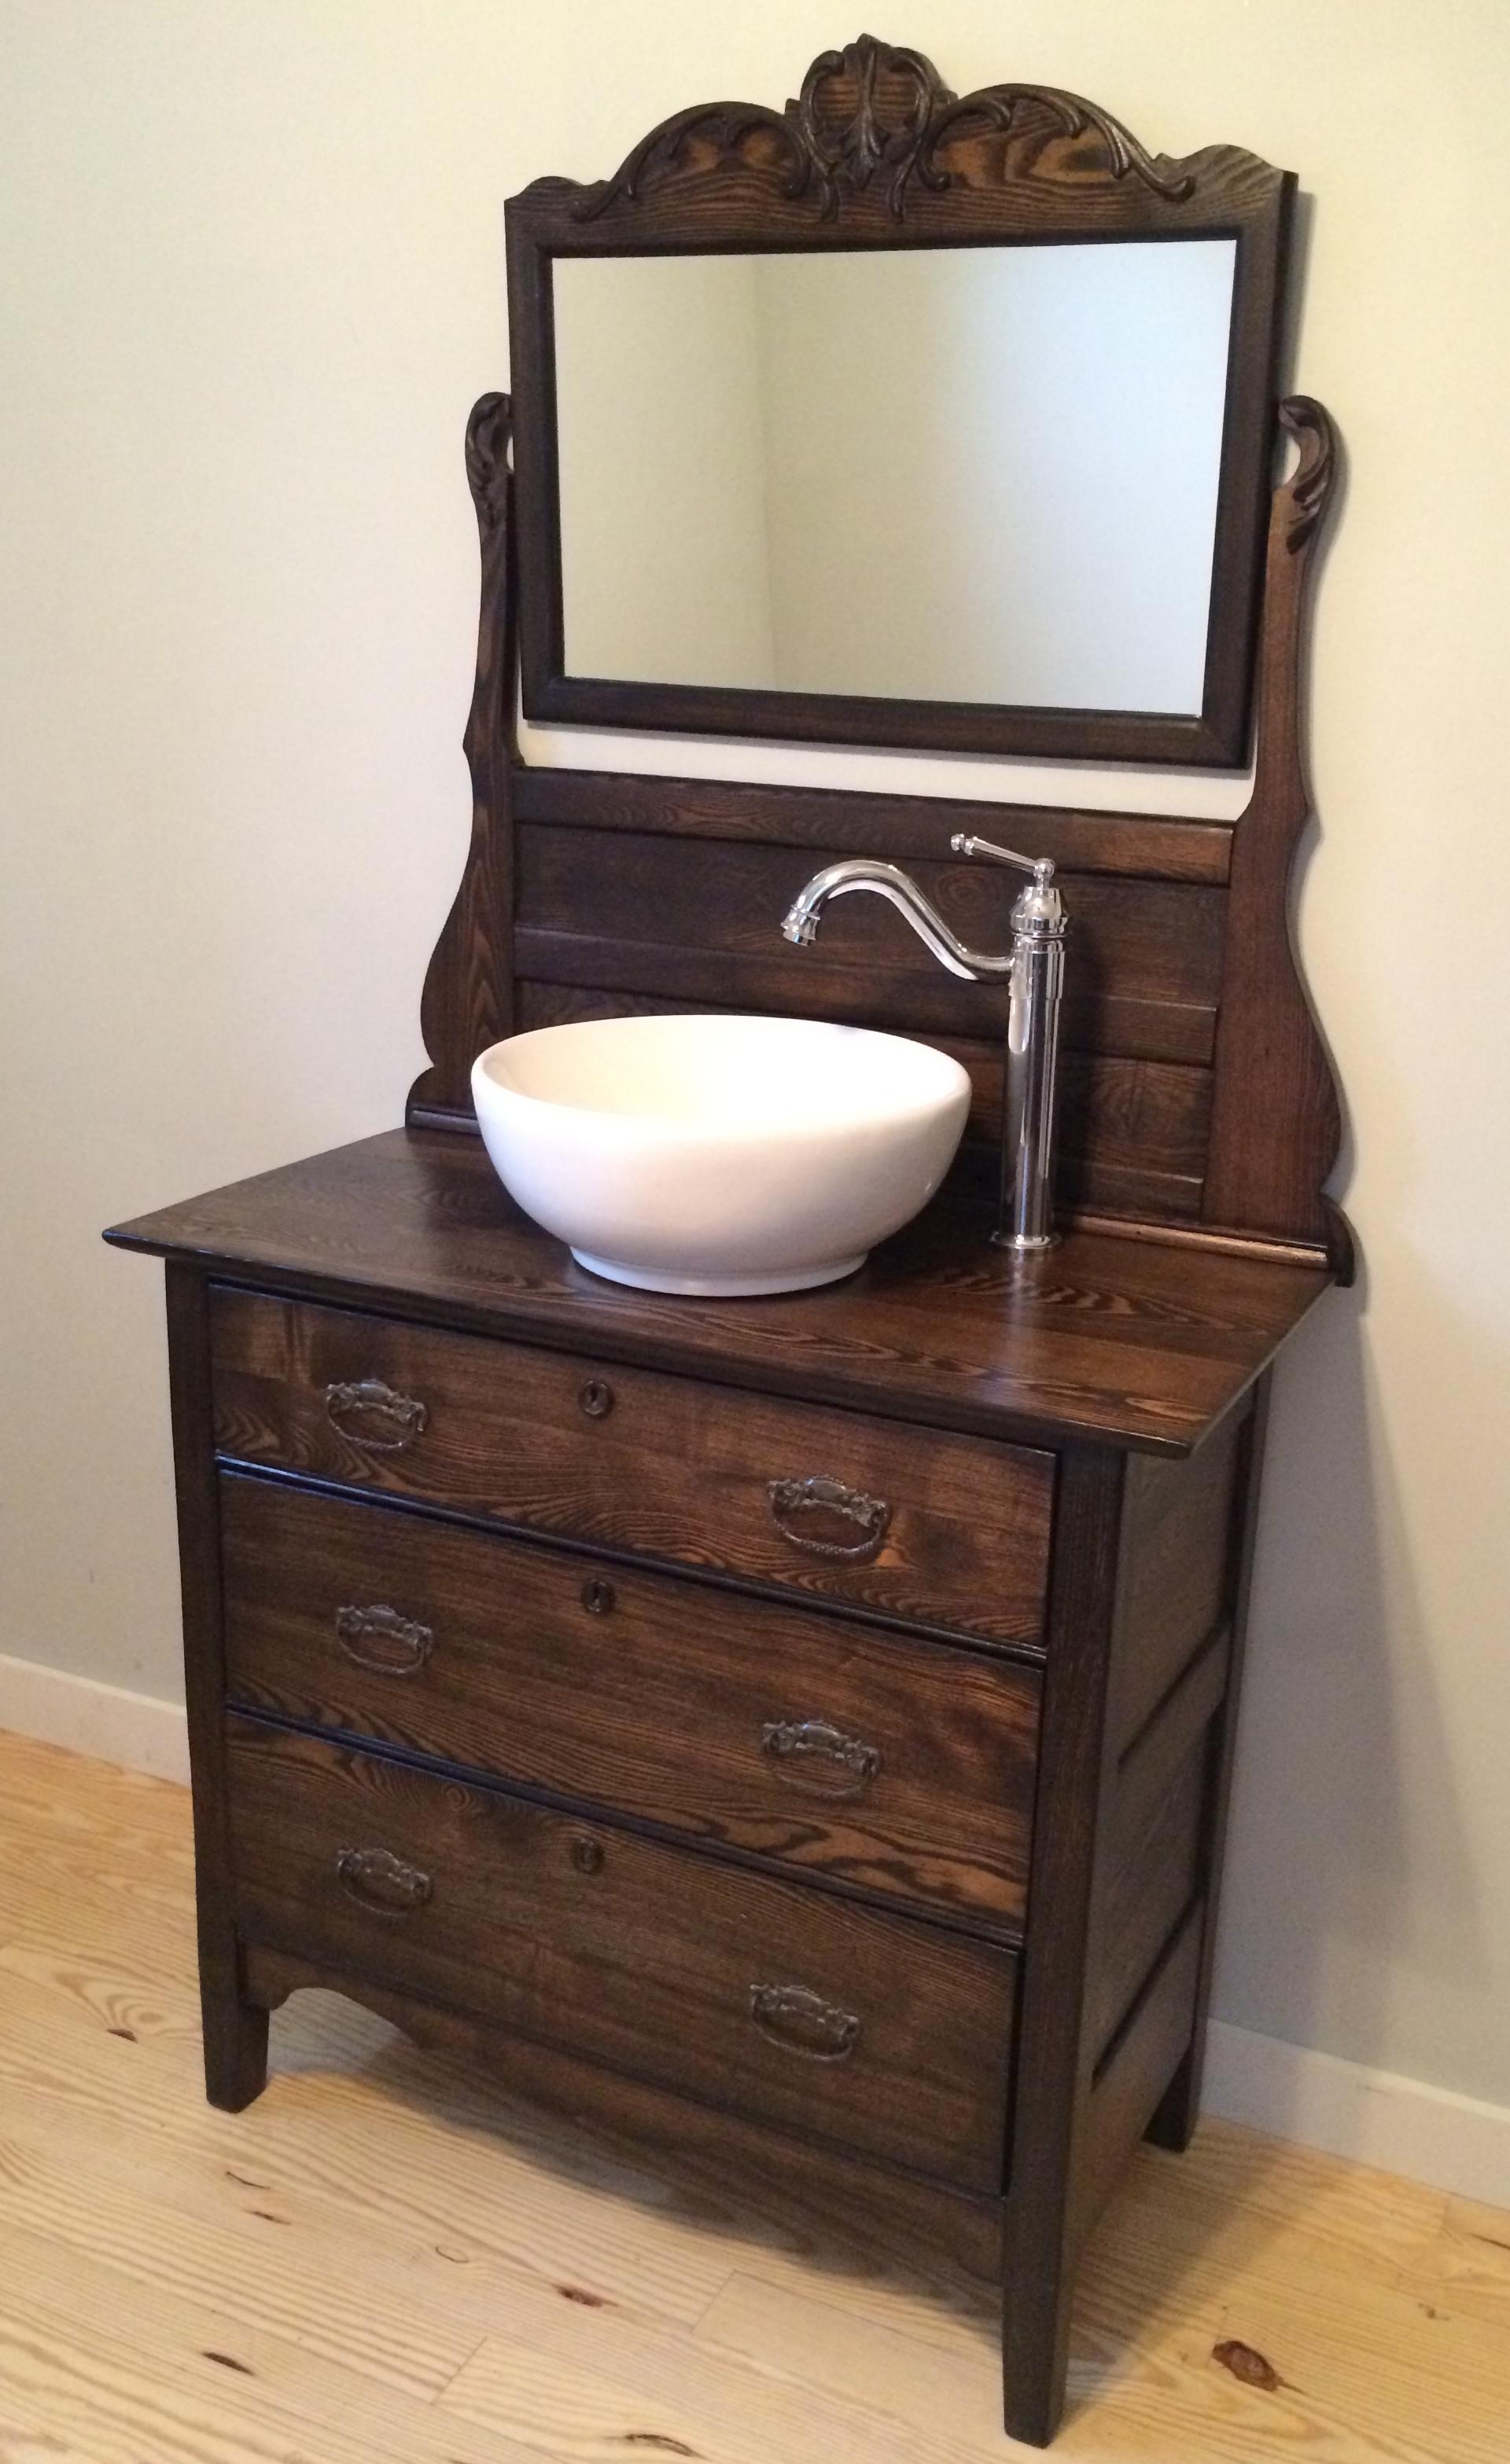 Solid oak dresser conversion